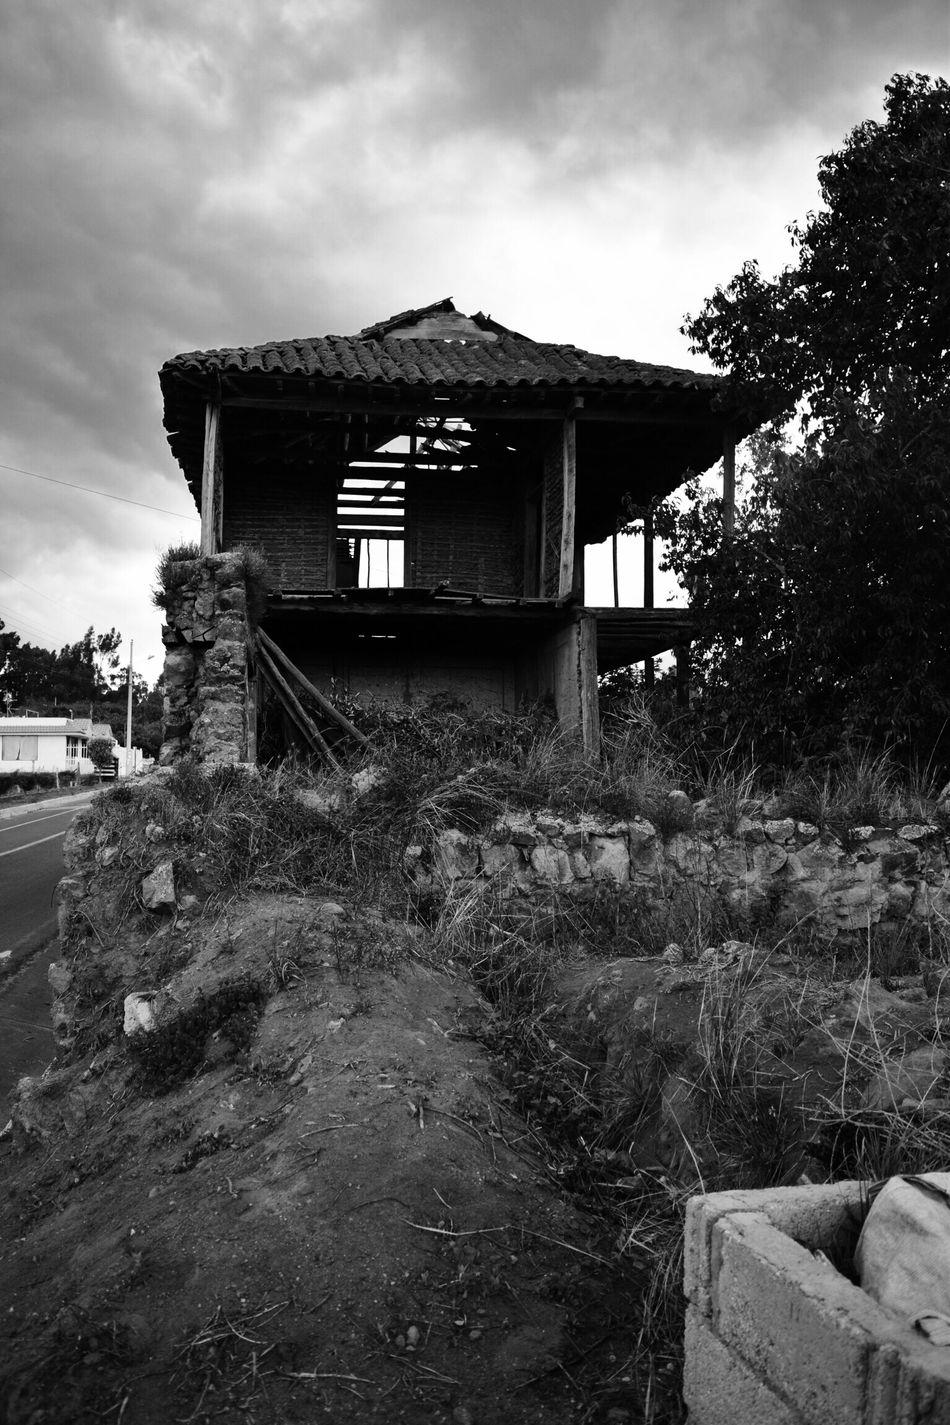 Cevallos Ambato Temblor Earthquake Volcanic  Destruction Destruction Can Be Beautiful EyeEm Best Shots EyeEm Gallery EyeEmBestPics EyeEmNewHere Carnival Crowds And Details